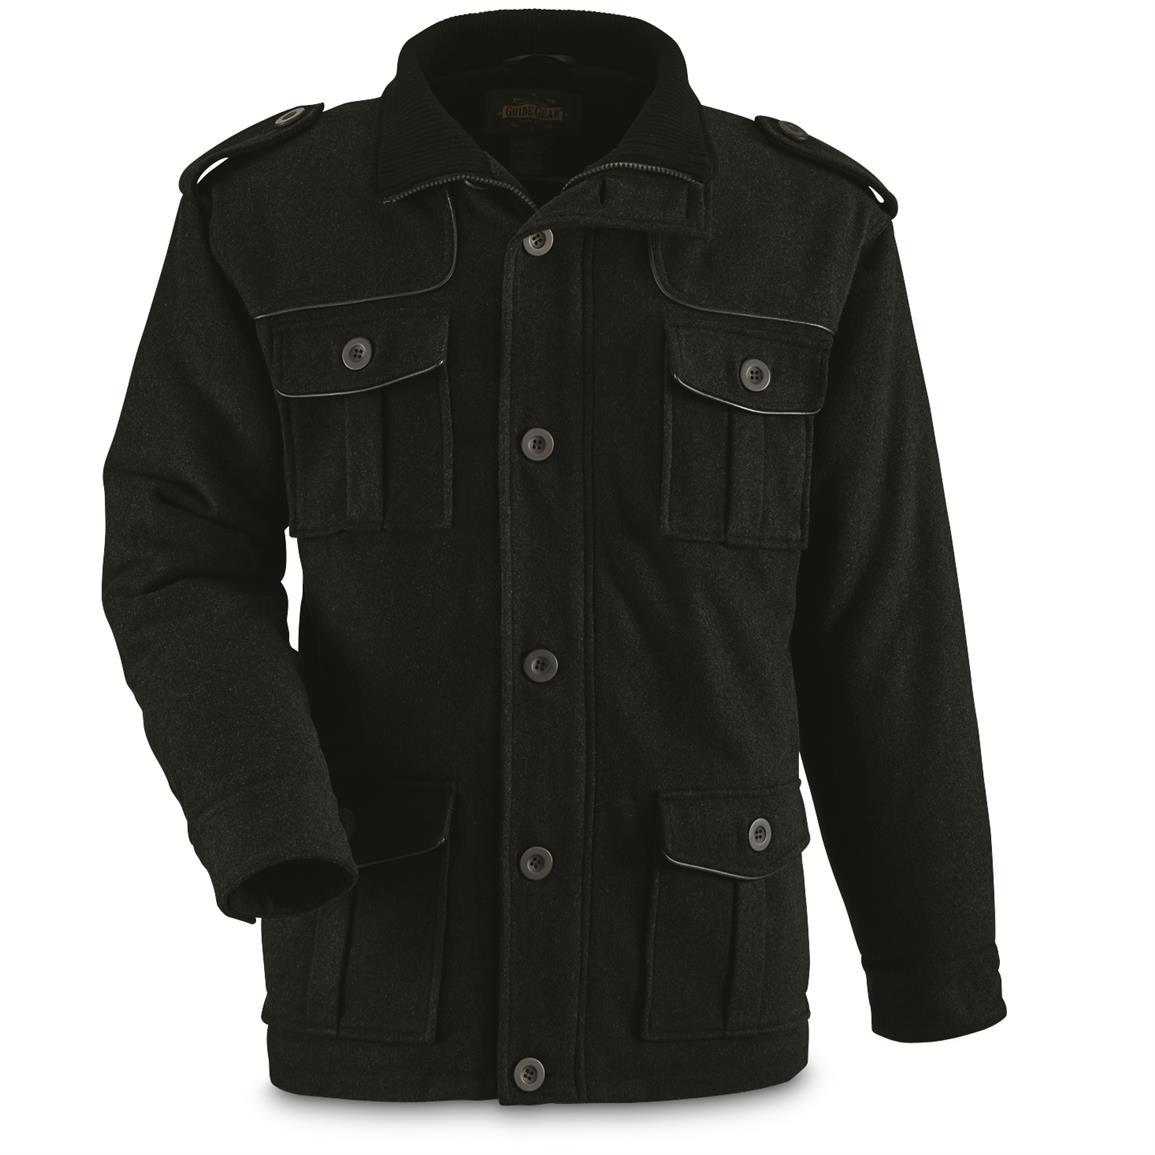 mens military style jackets photo - 1